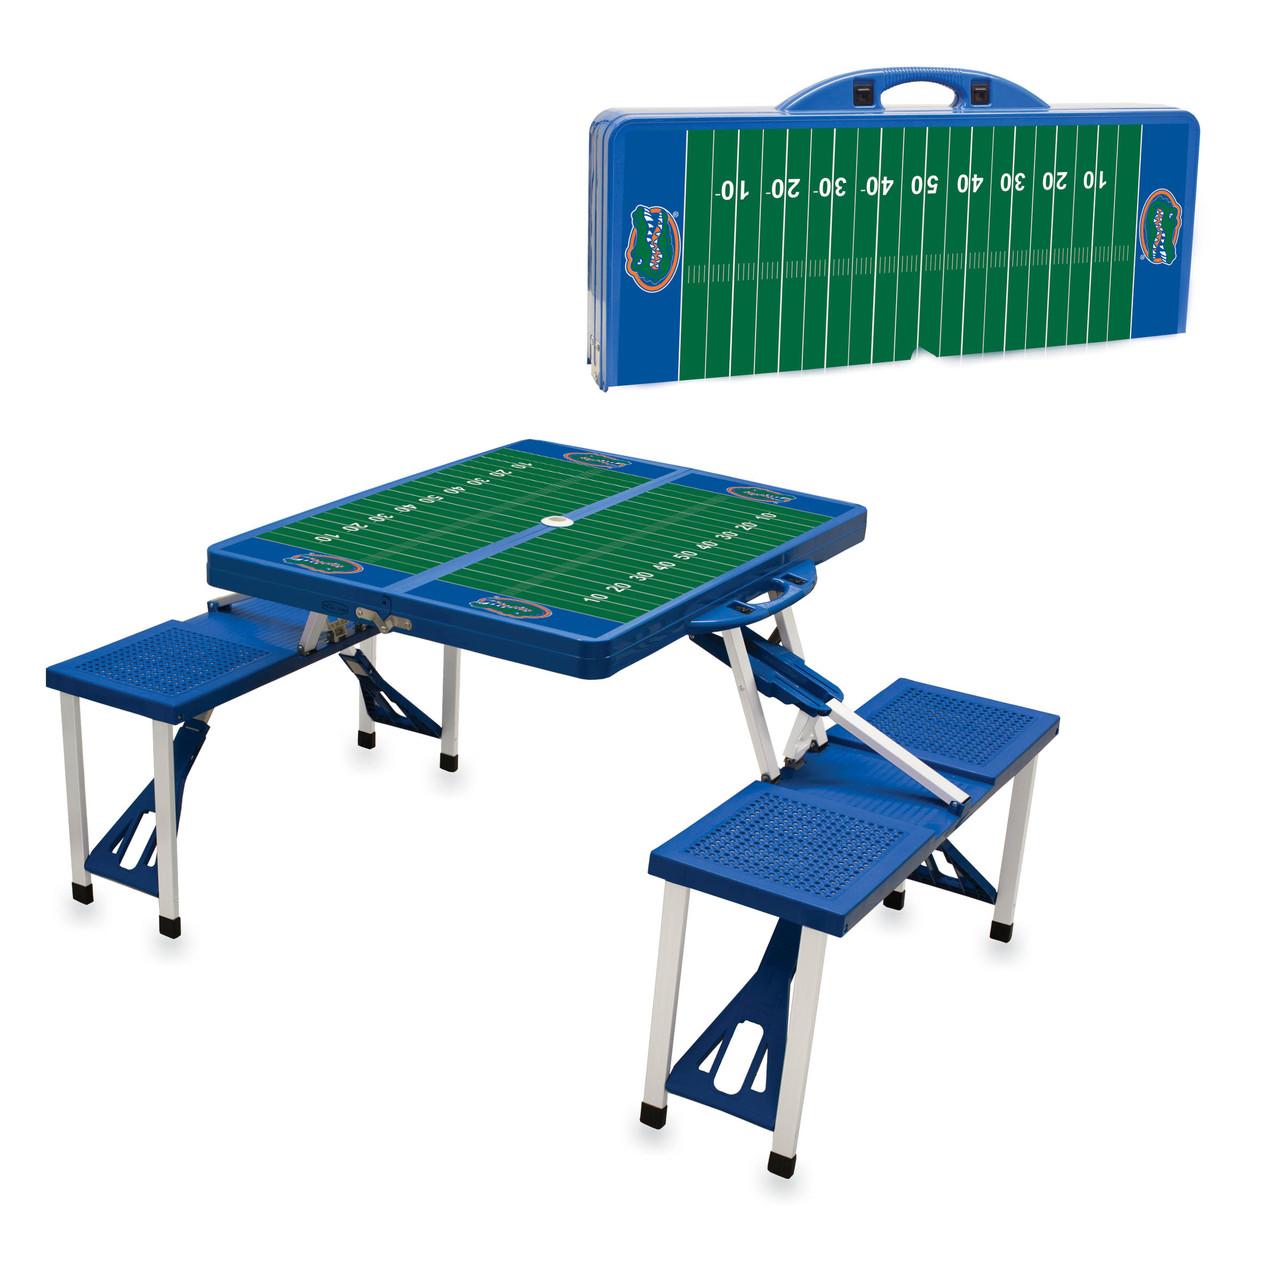 Picnic Table Sport - University of Florida